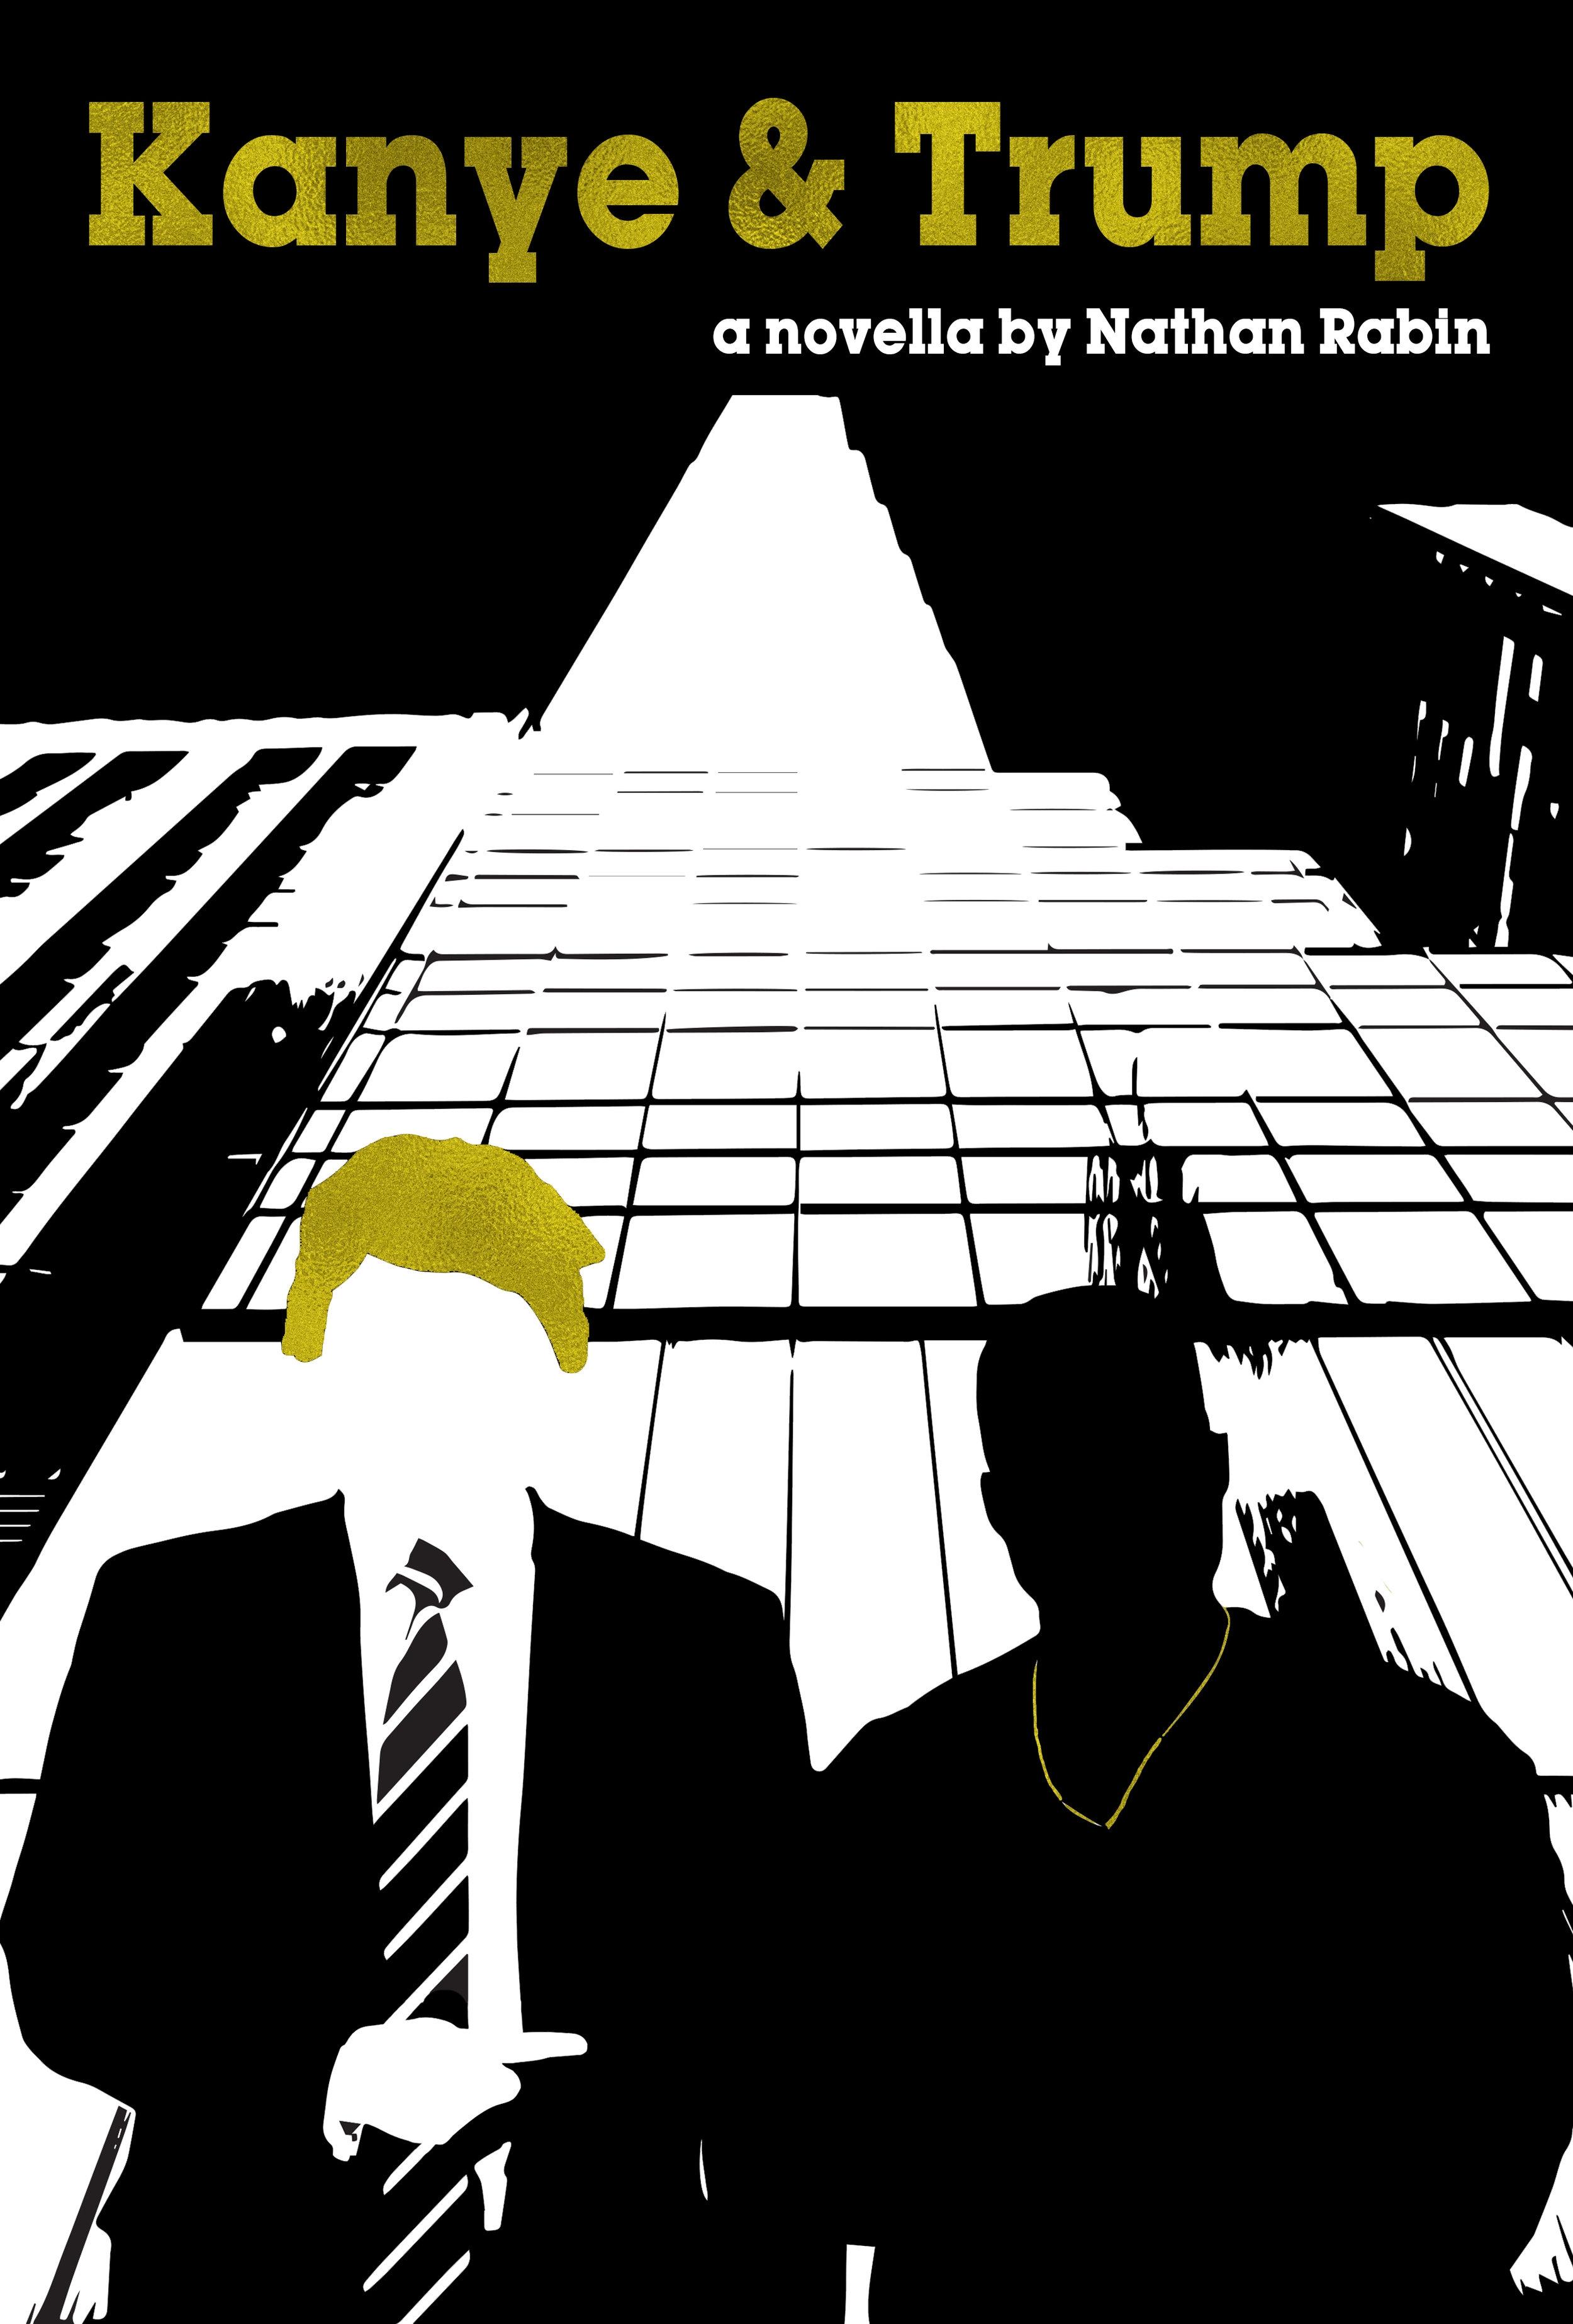 Kanye & Trump: a Novella